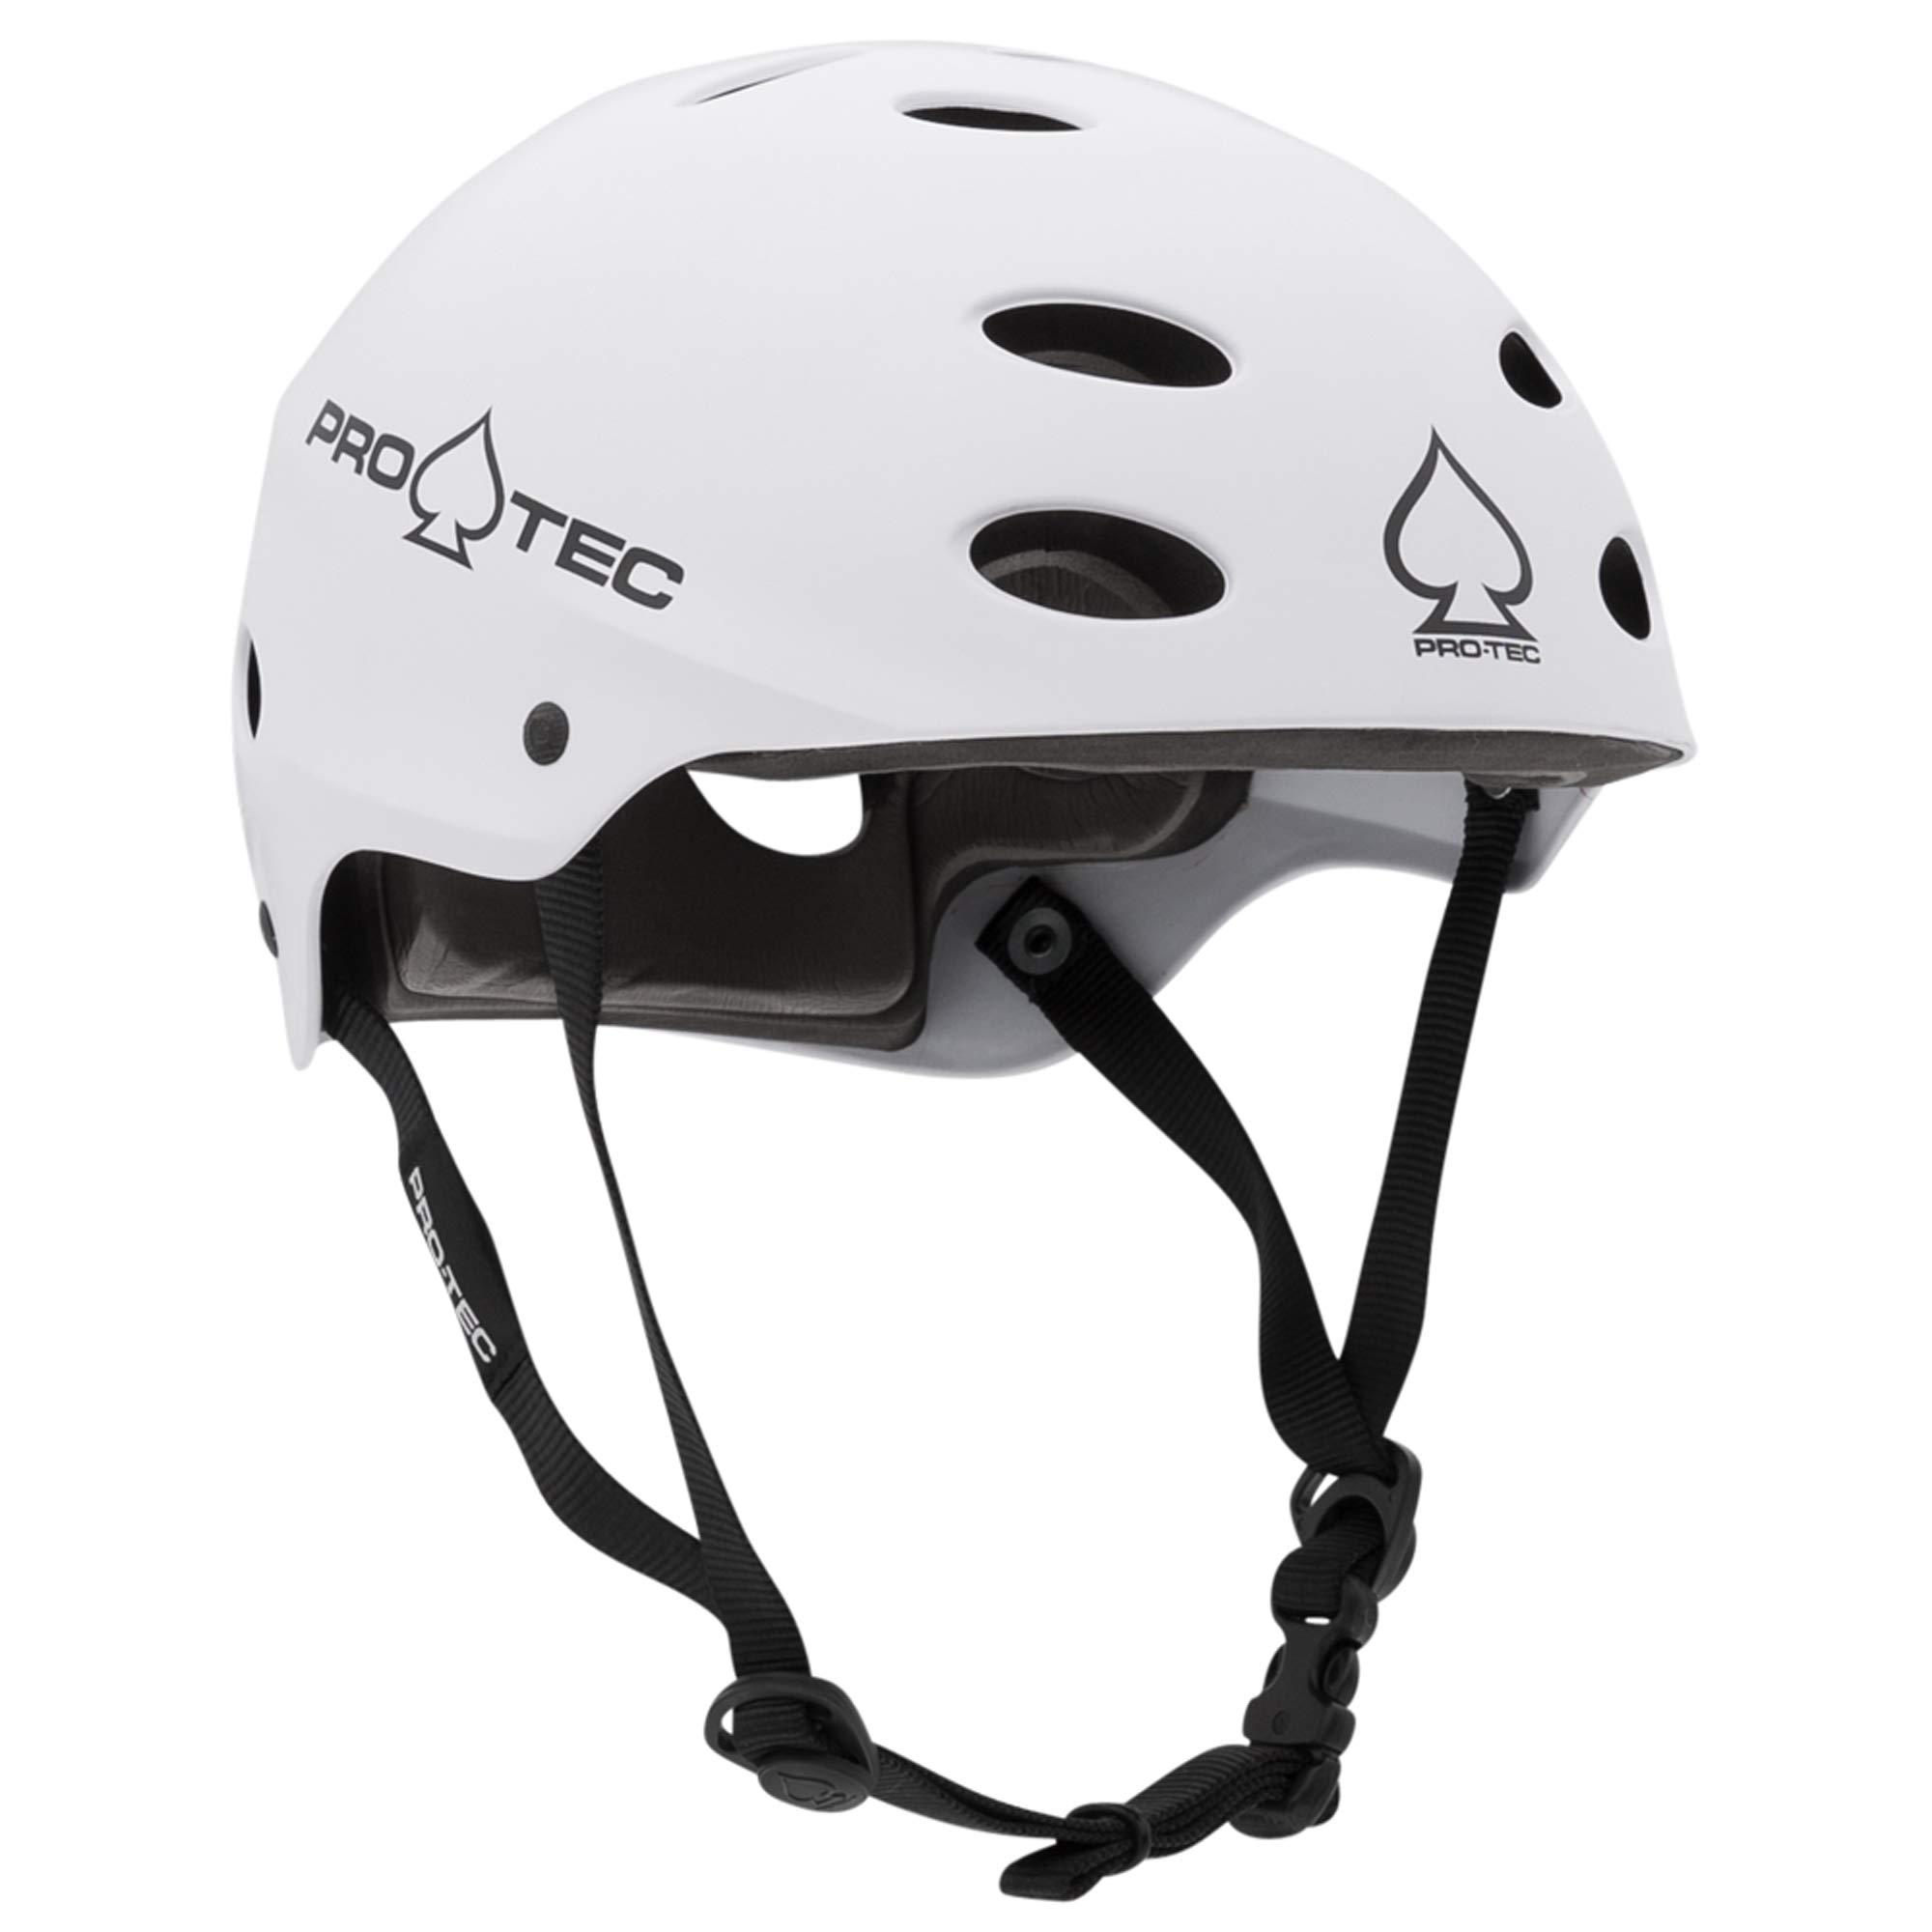 Pro-Tec - Ace Water Helmet, Satin White, M by Pro-Tec